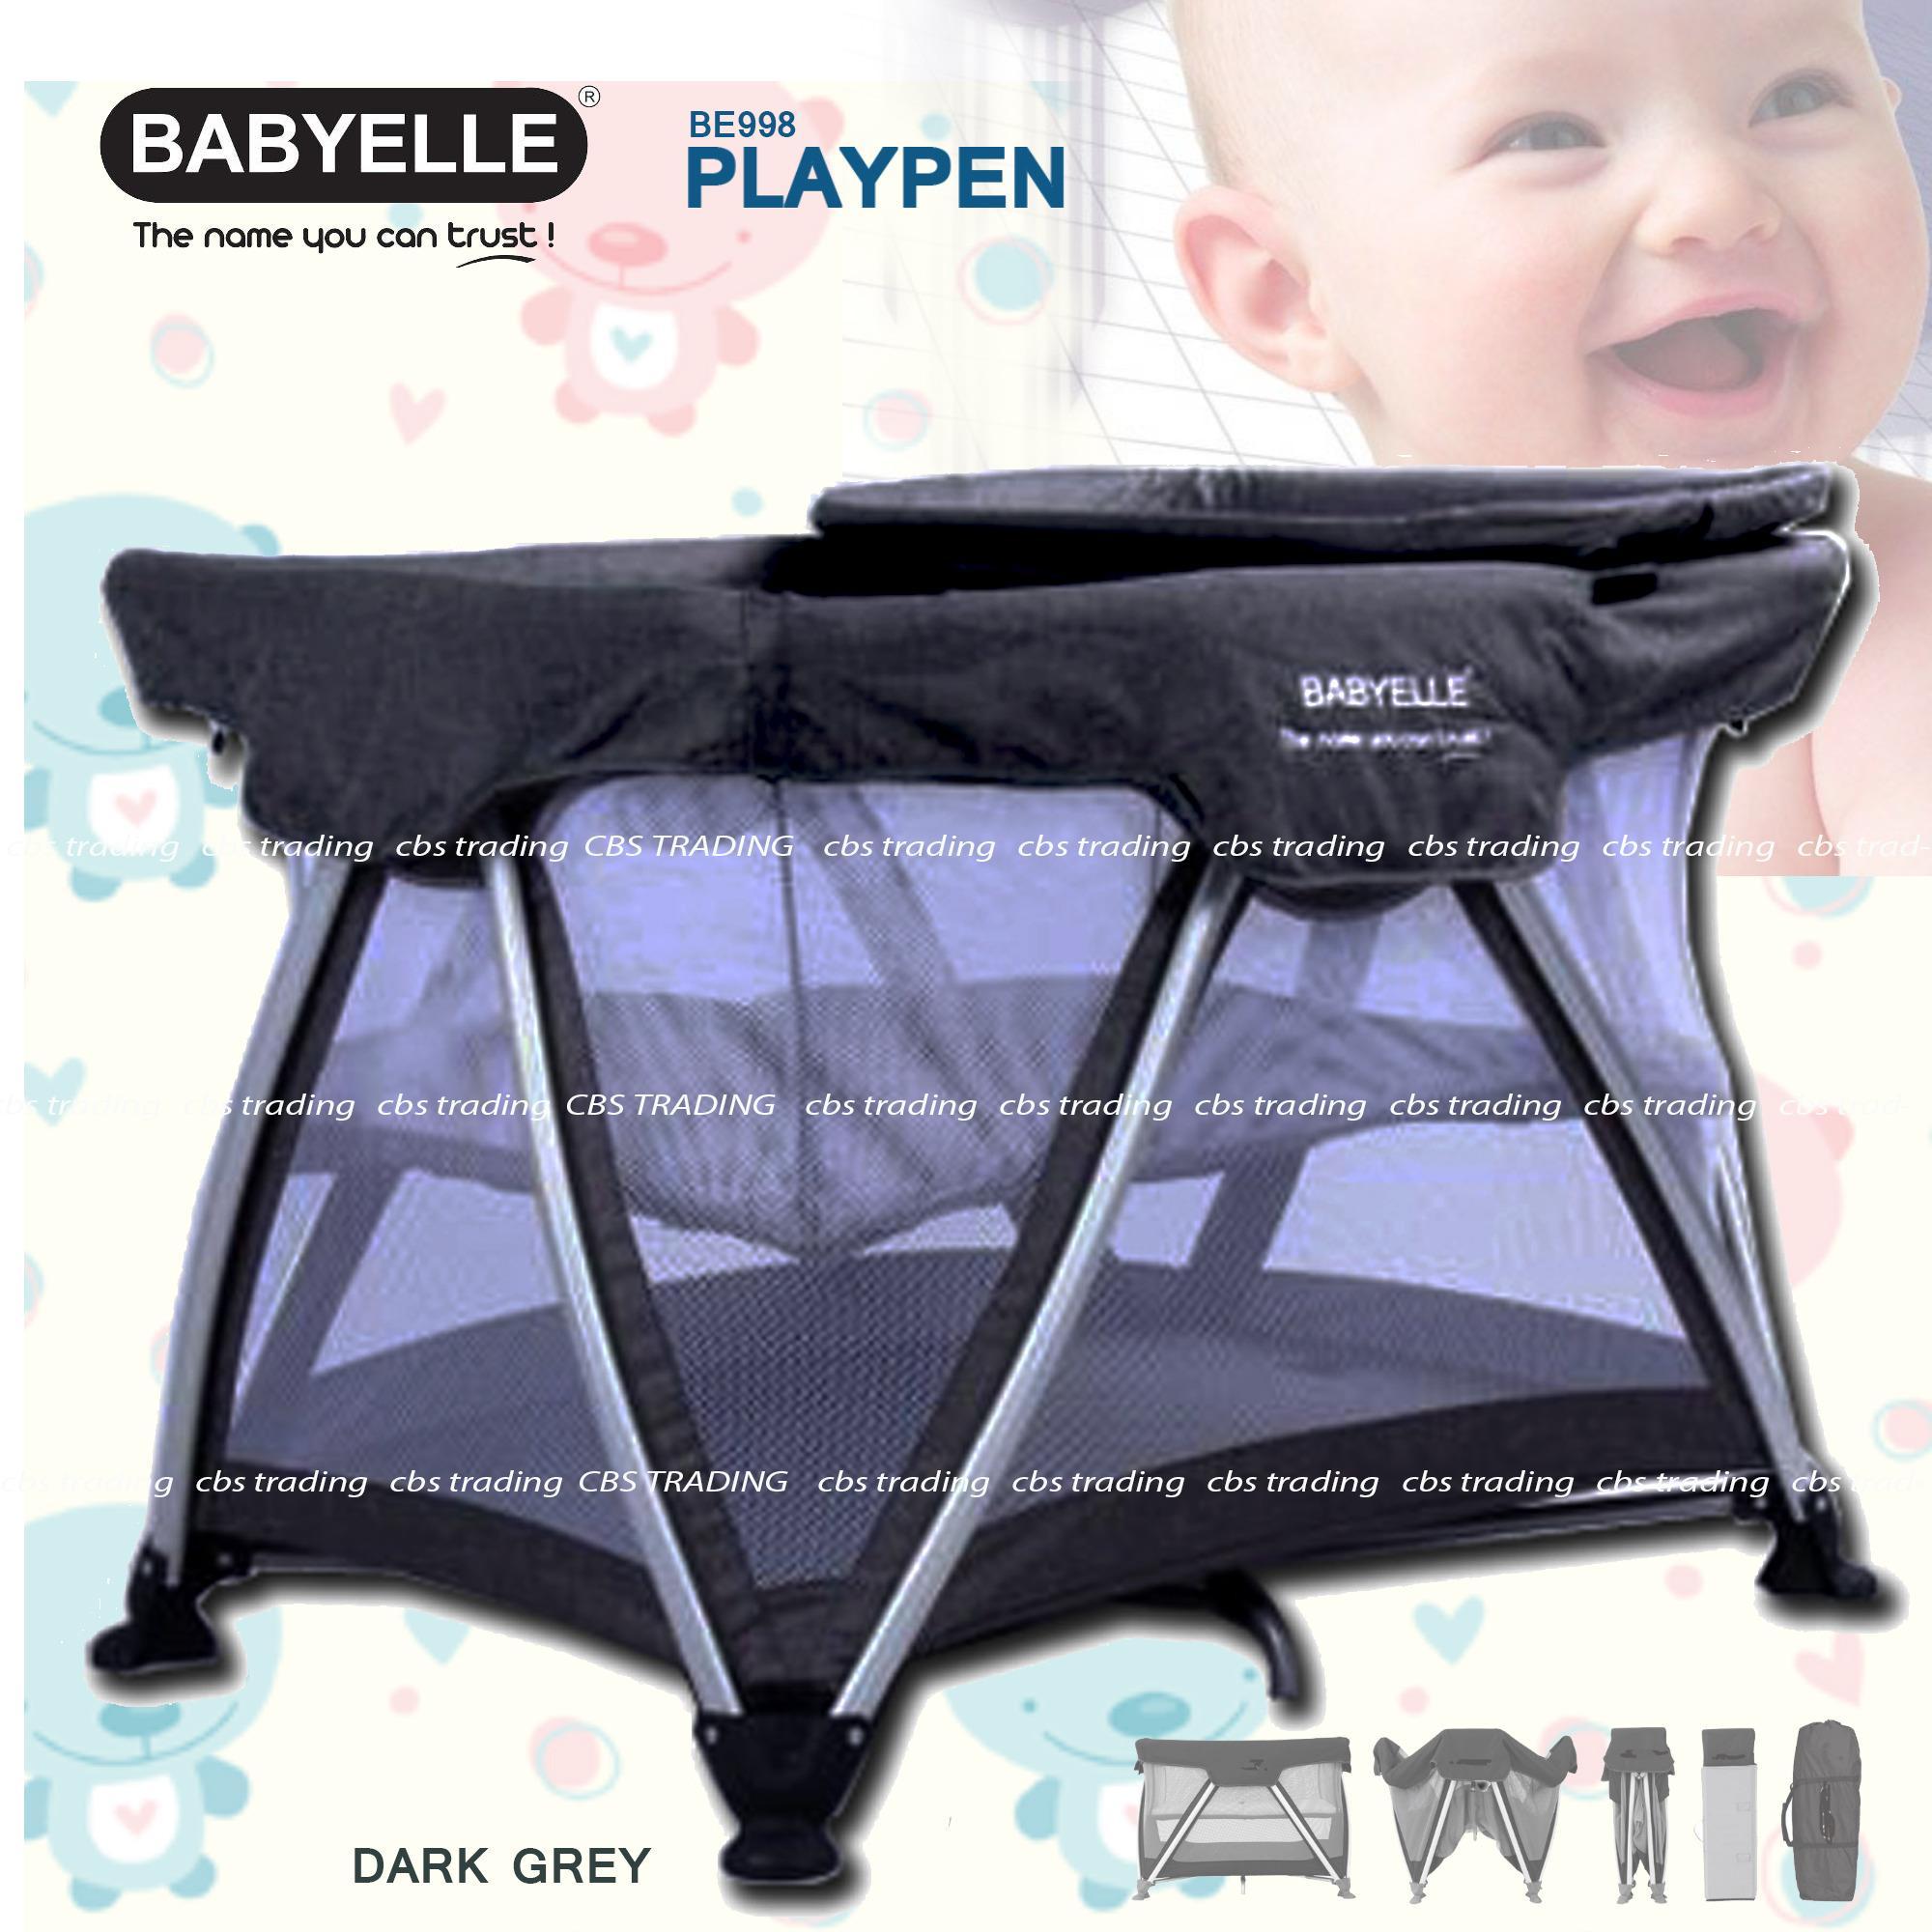 Babyelle Baby Box Playard Playpen New 998 - Box Bayi - Ranjang Bayi - Abu2 By Cbs Trading.